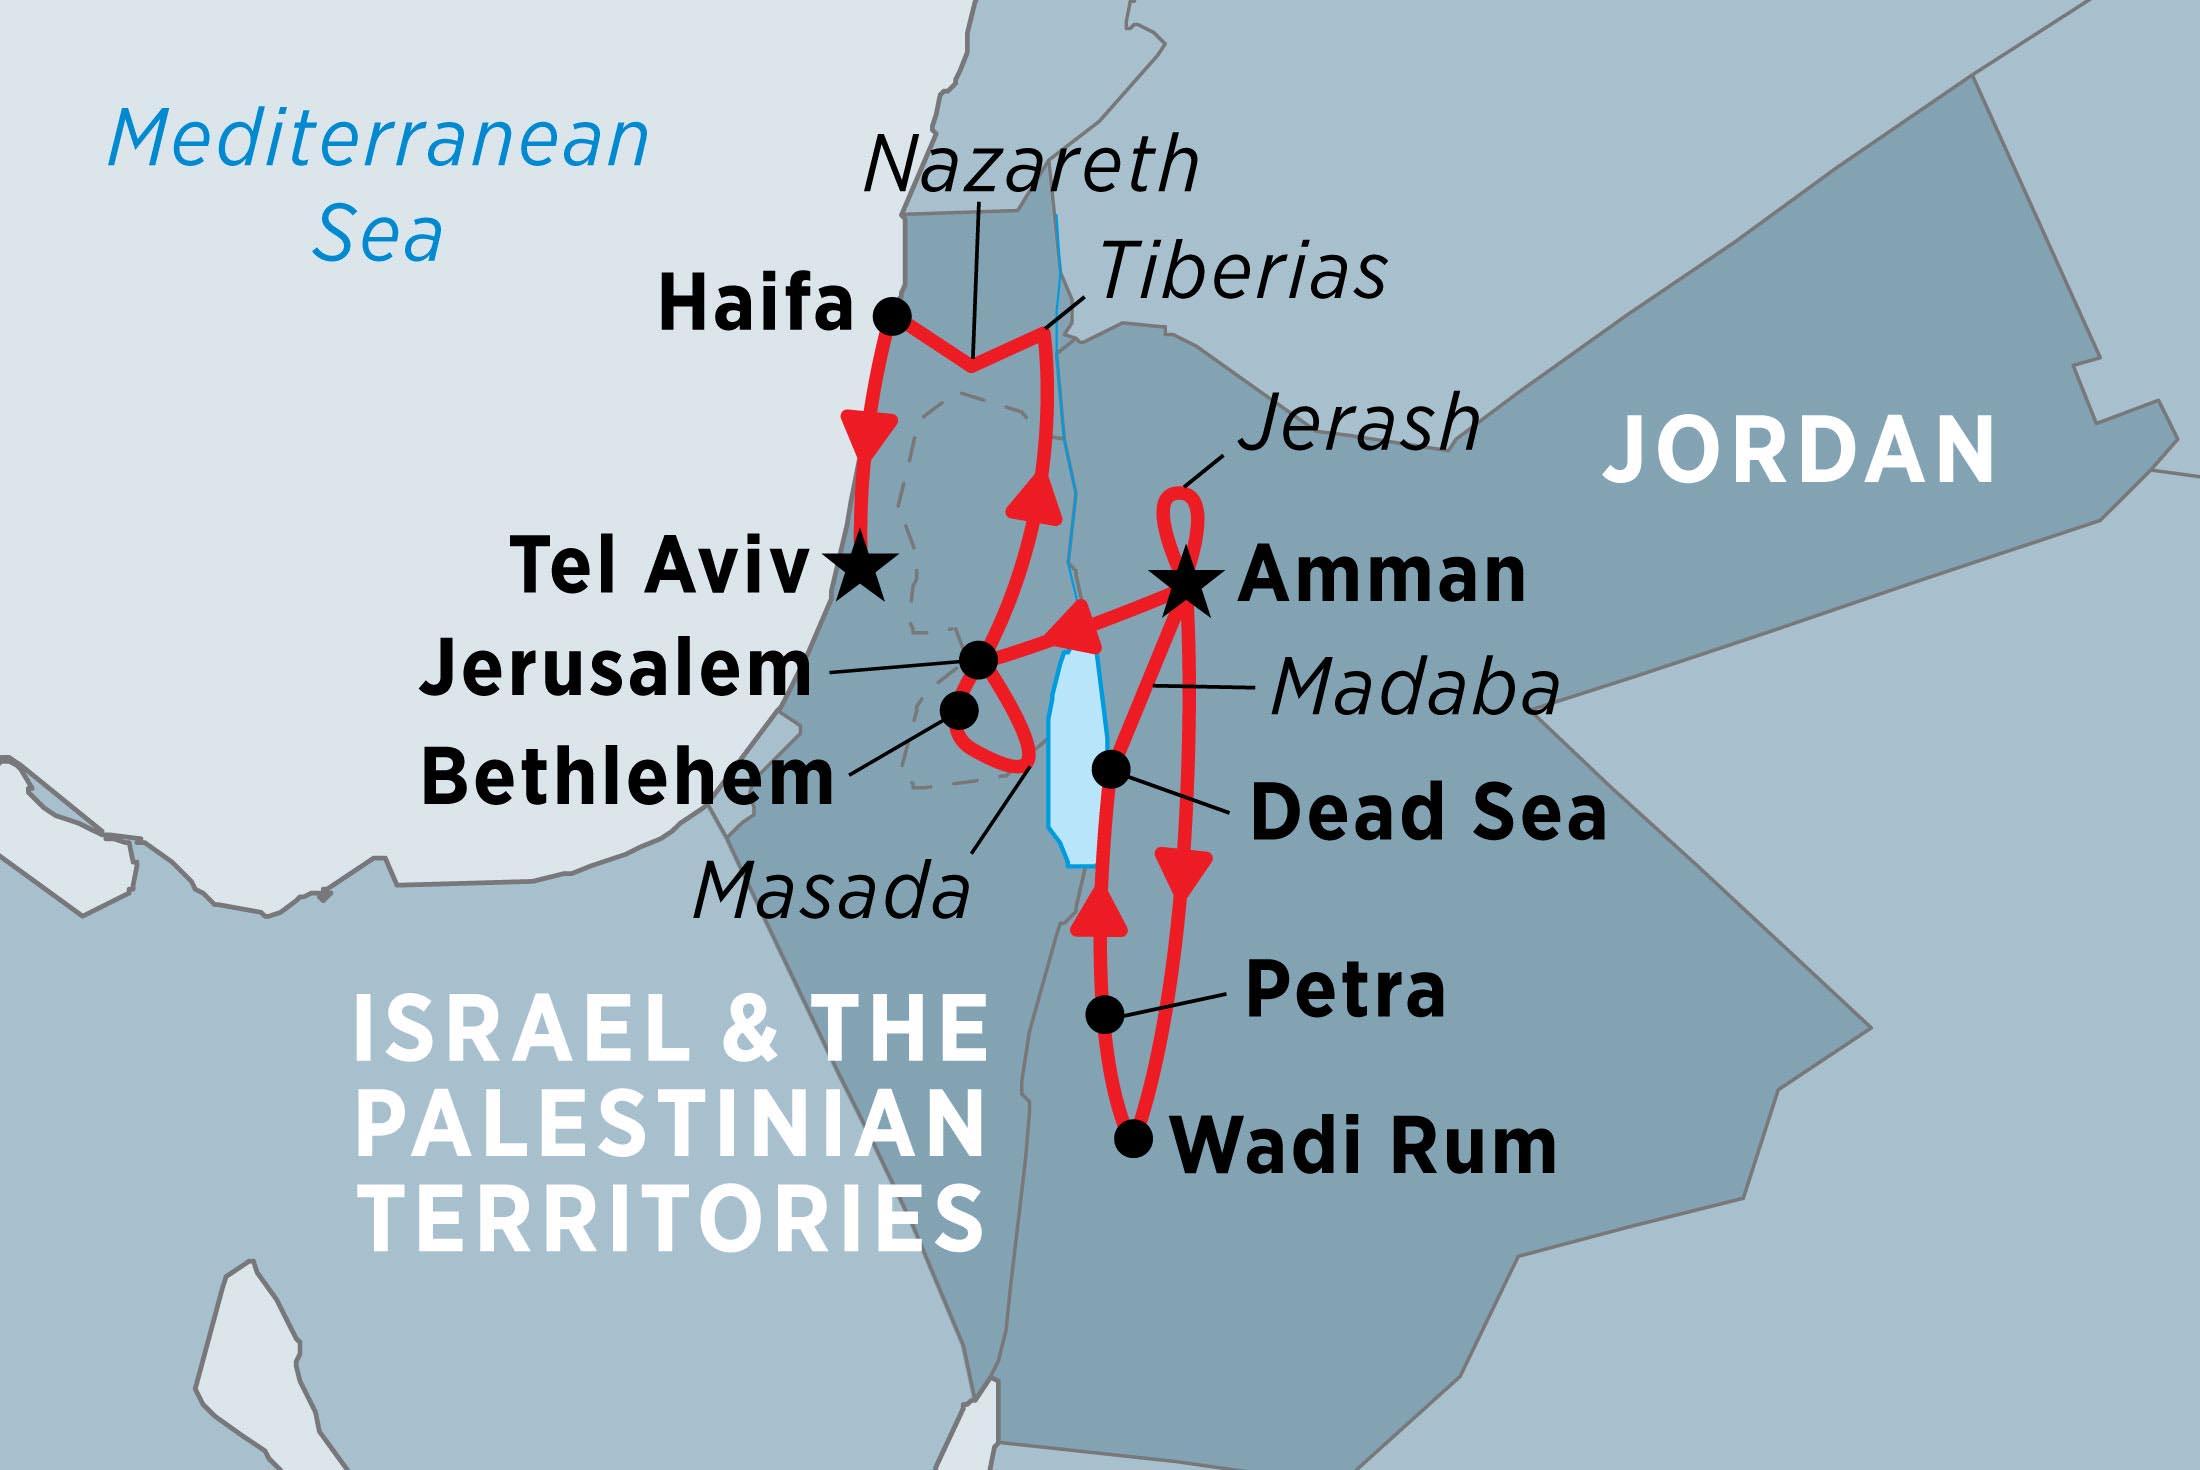 borroso bloquear Conciliador  Jordan, Israel & the Palestinian Territories | Peregrine Adventures US